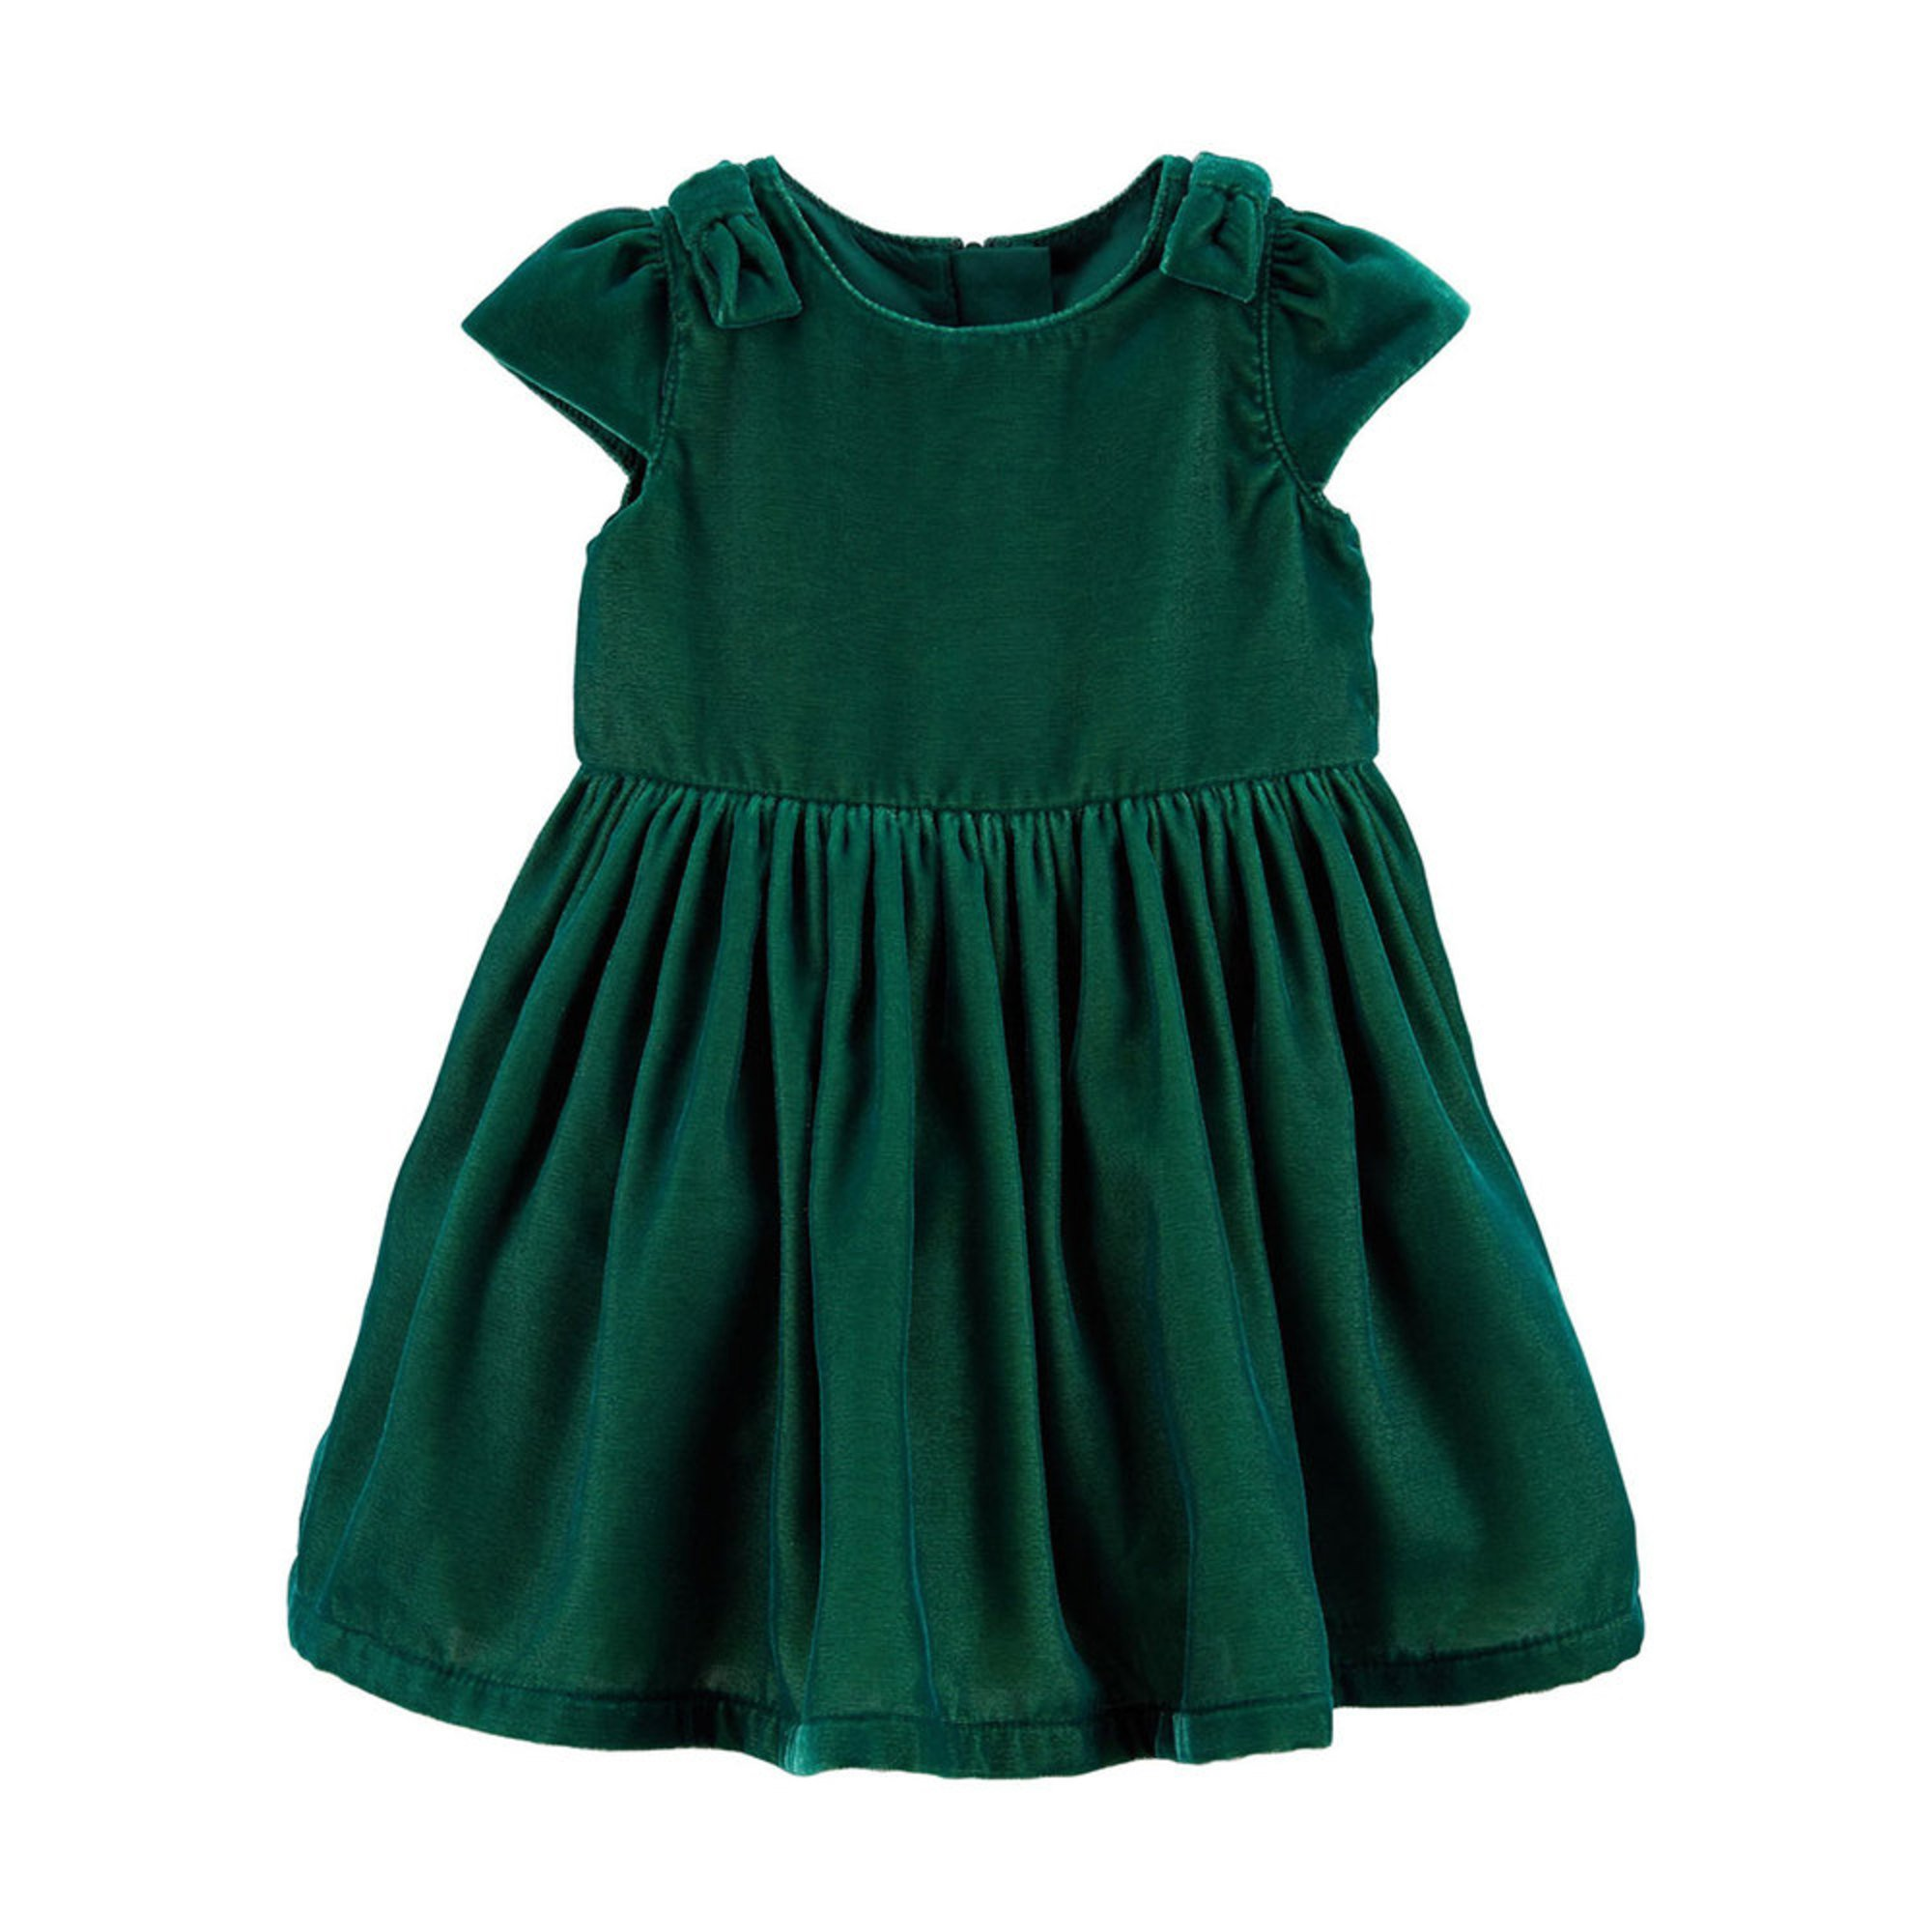 468194b9a6 Carter s. Carter s Baby Girls  Holiday Bow Velvet Dress